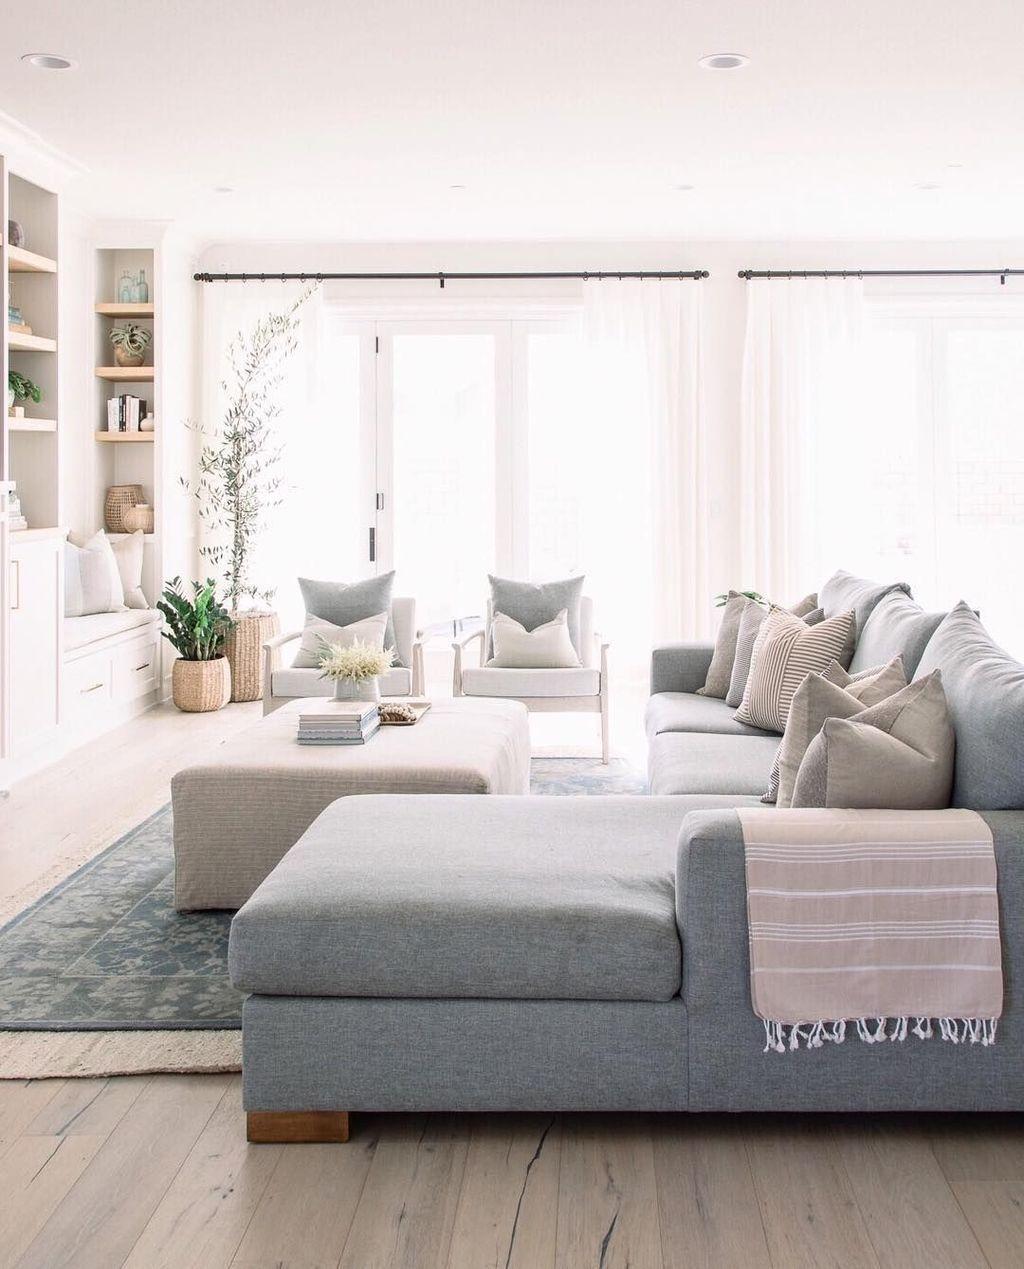 30 Smart Living Room Furniture DesignIdeen  COODECORcoodecor